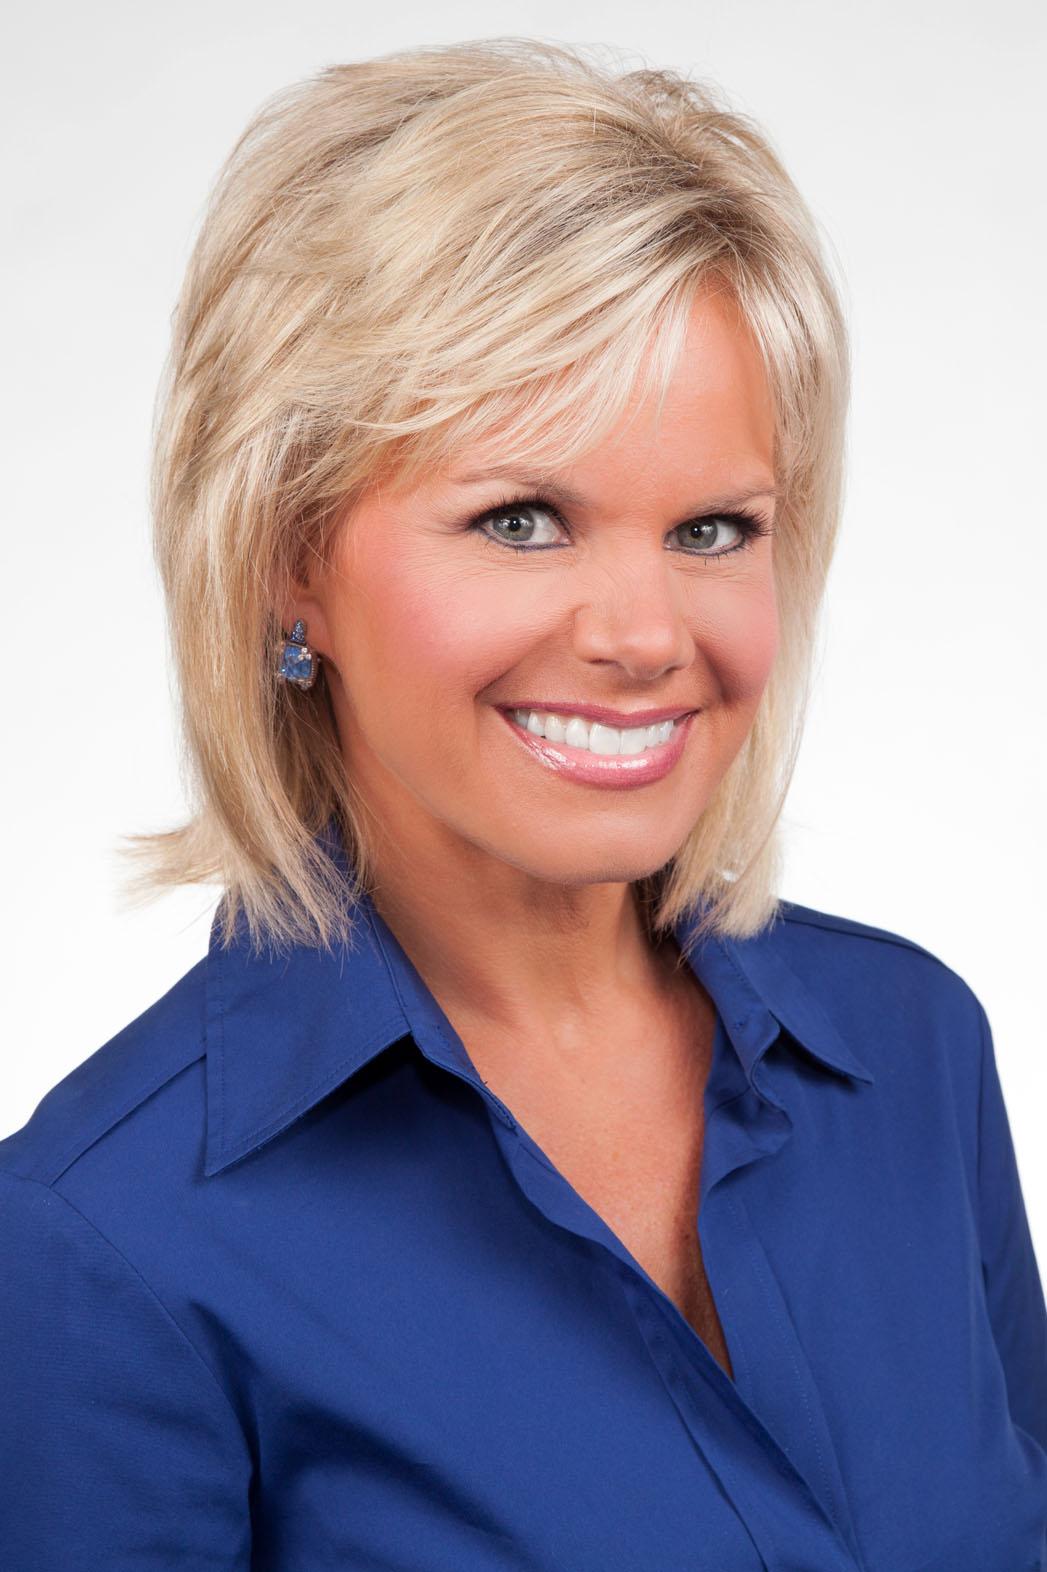 Gretchen Carlson Headshot - P 2013